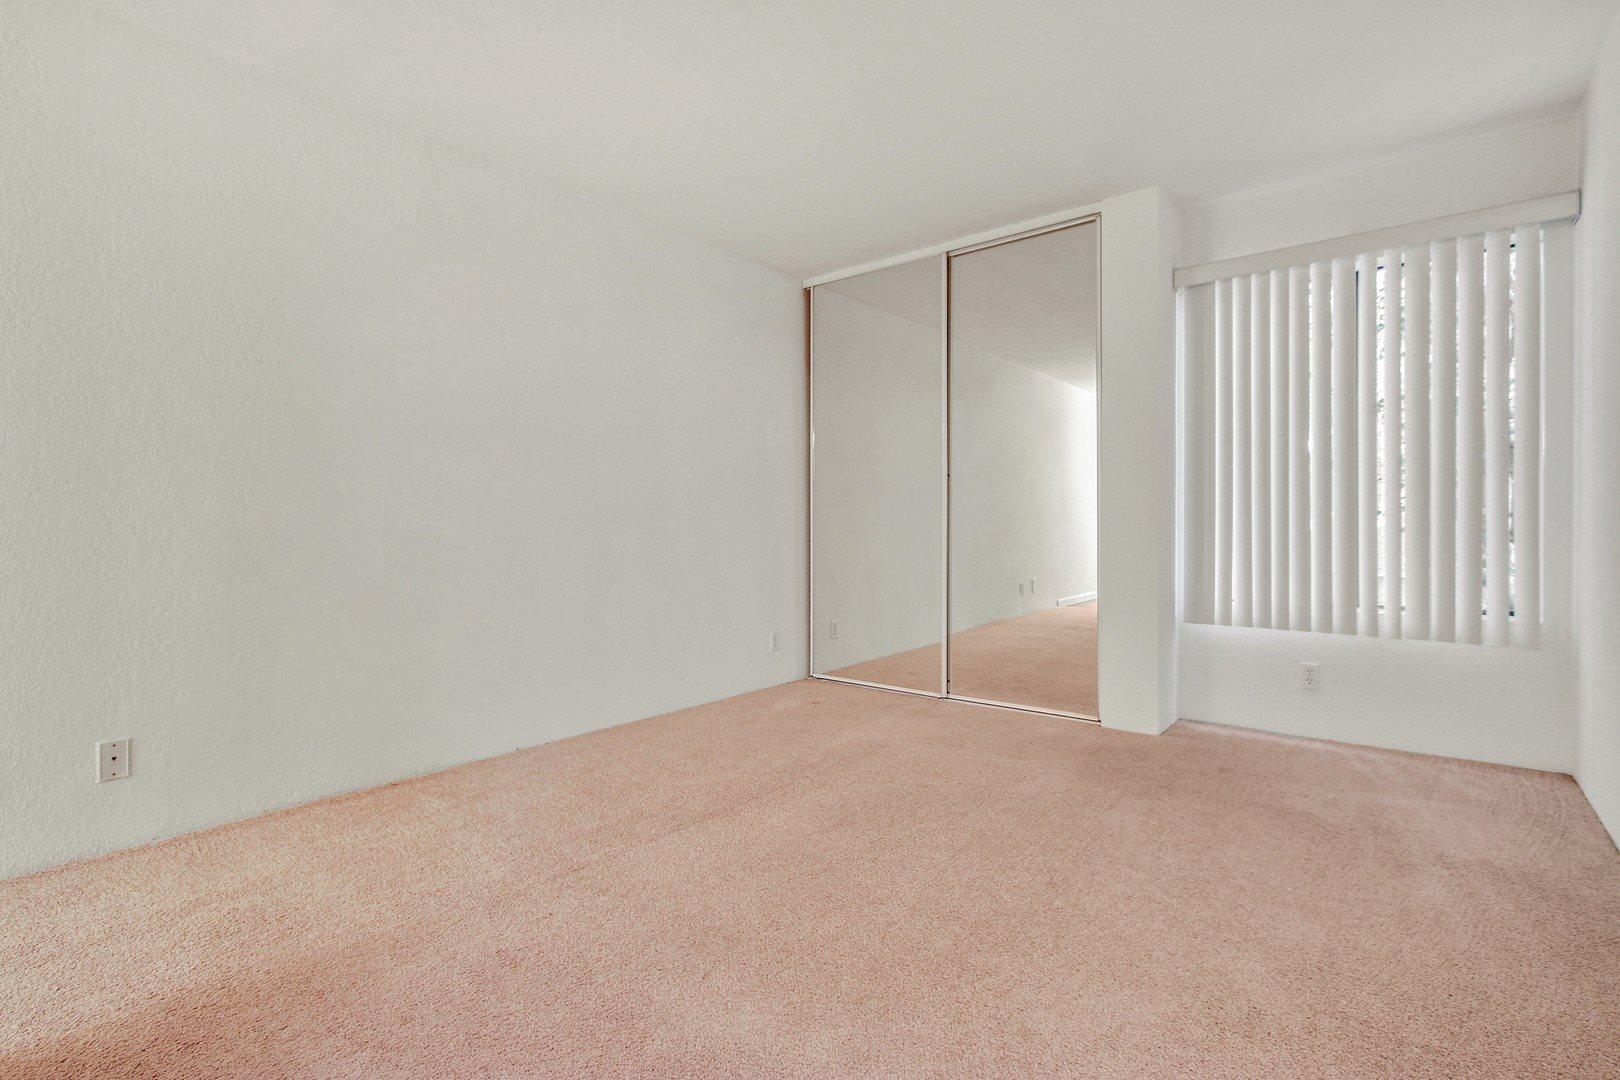 Interiors-Image30